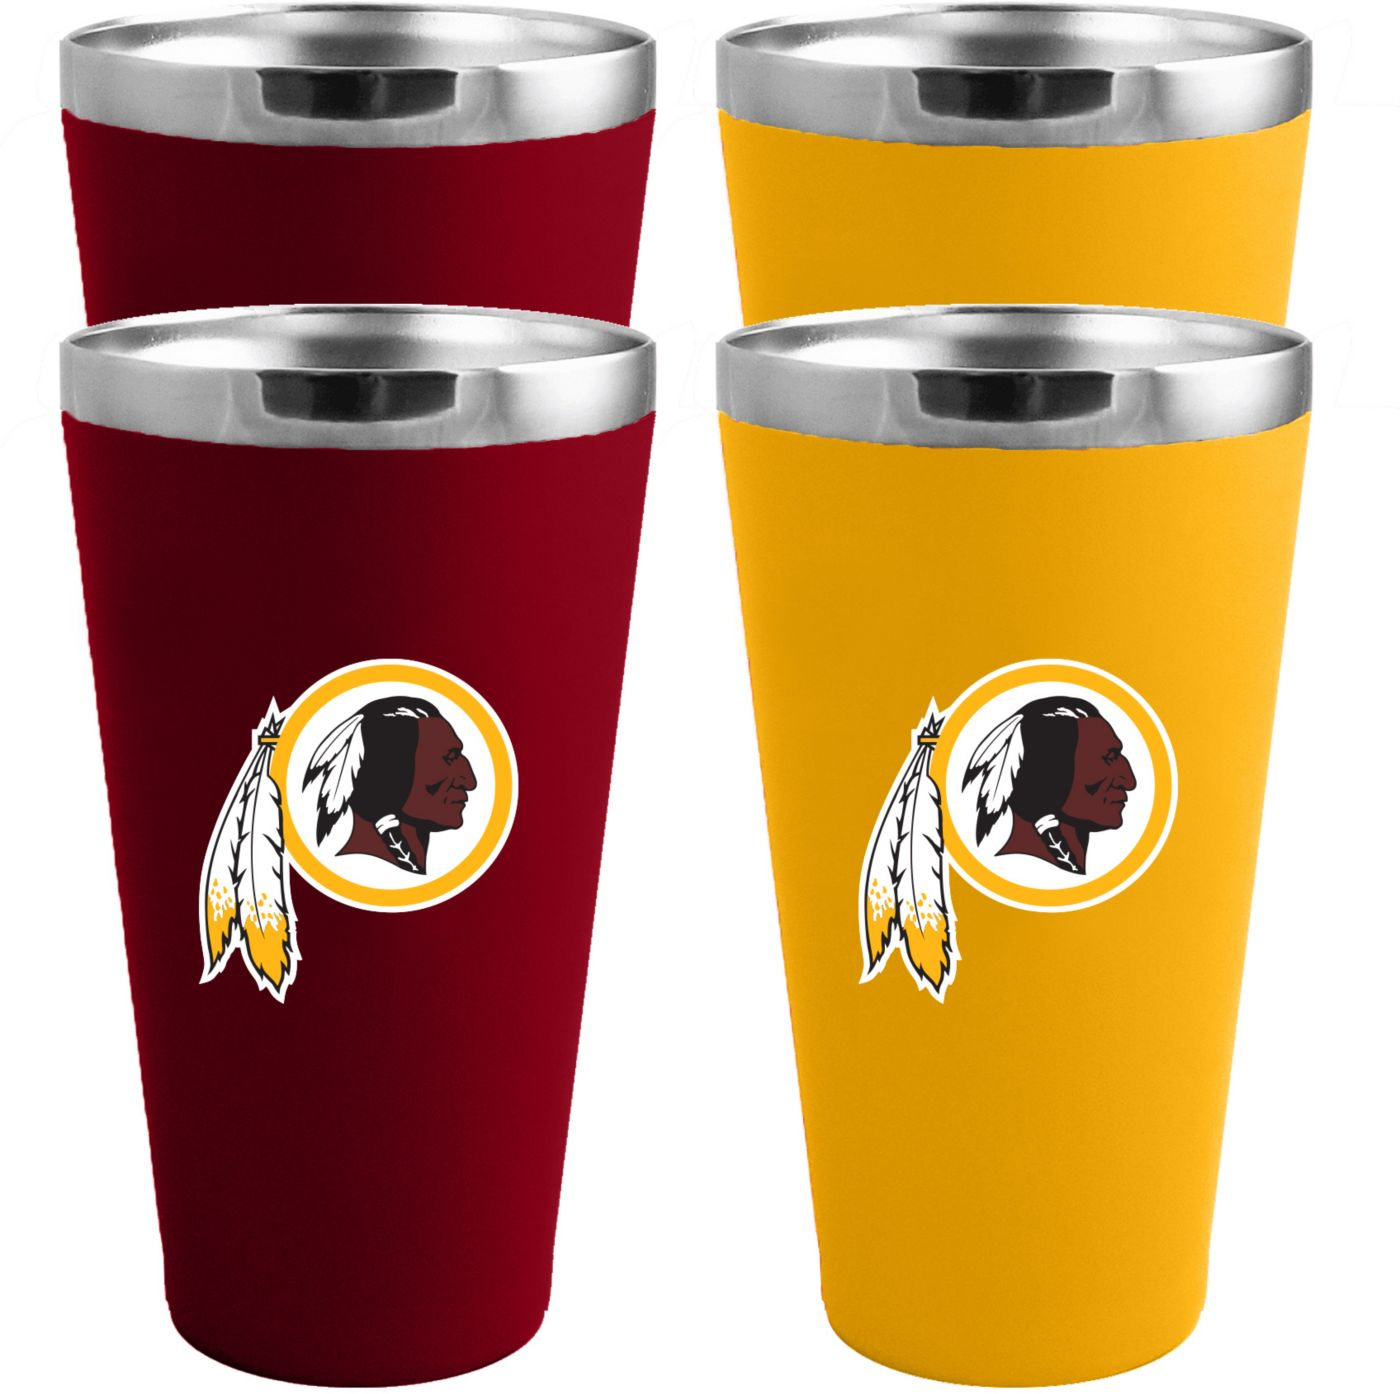 Memory Company Washington Redskins 4 Pack Drinkware Set